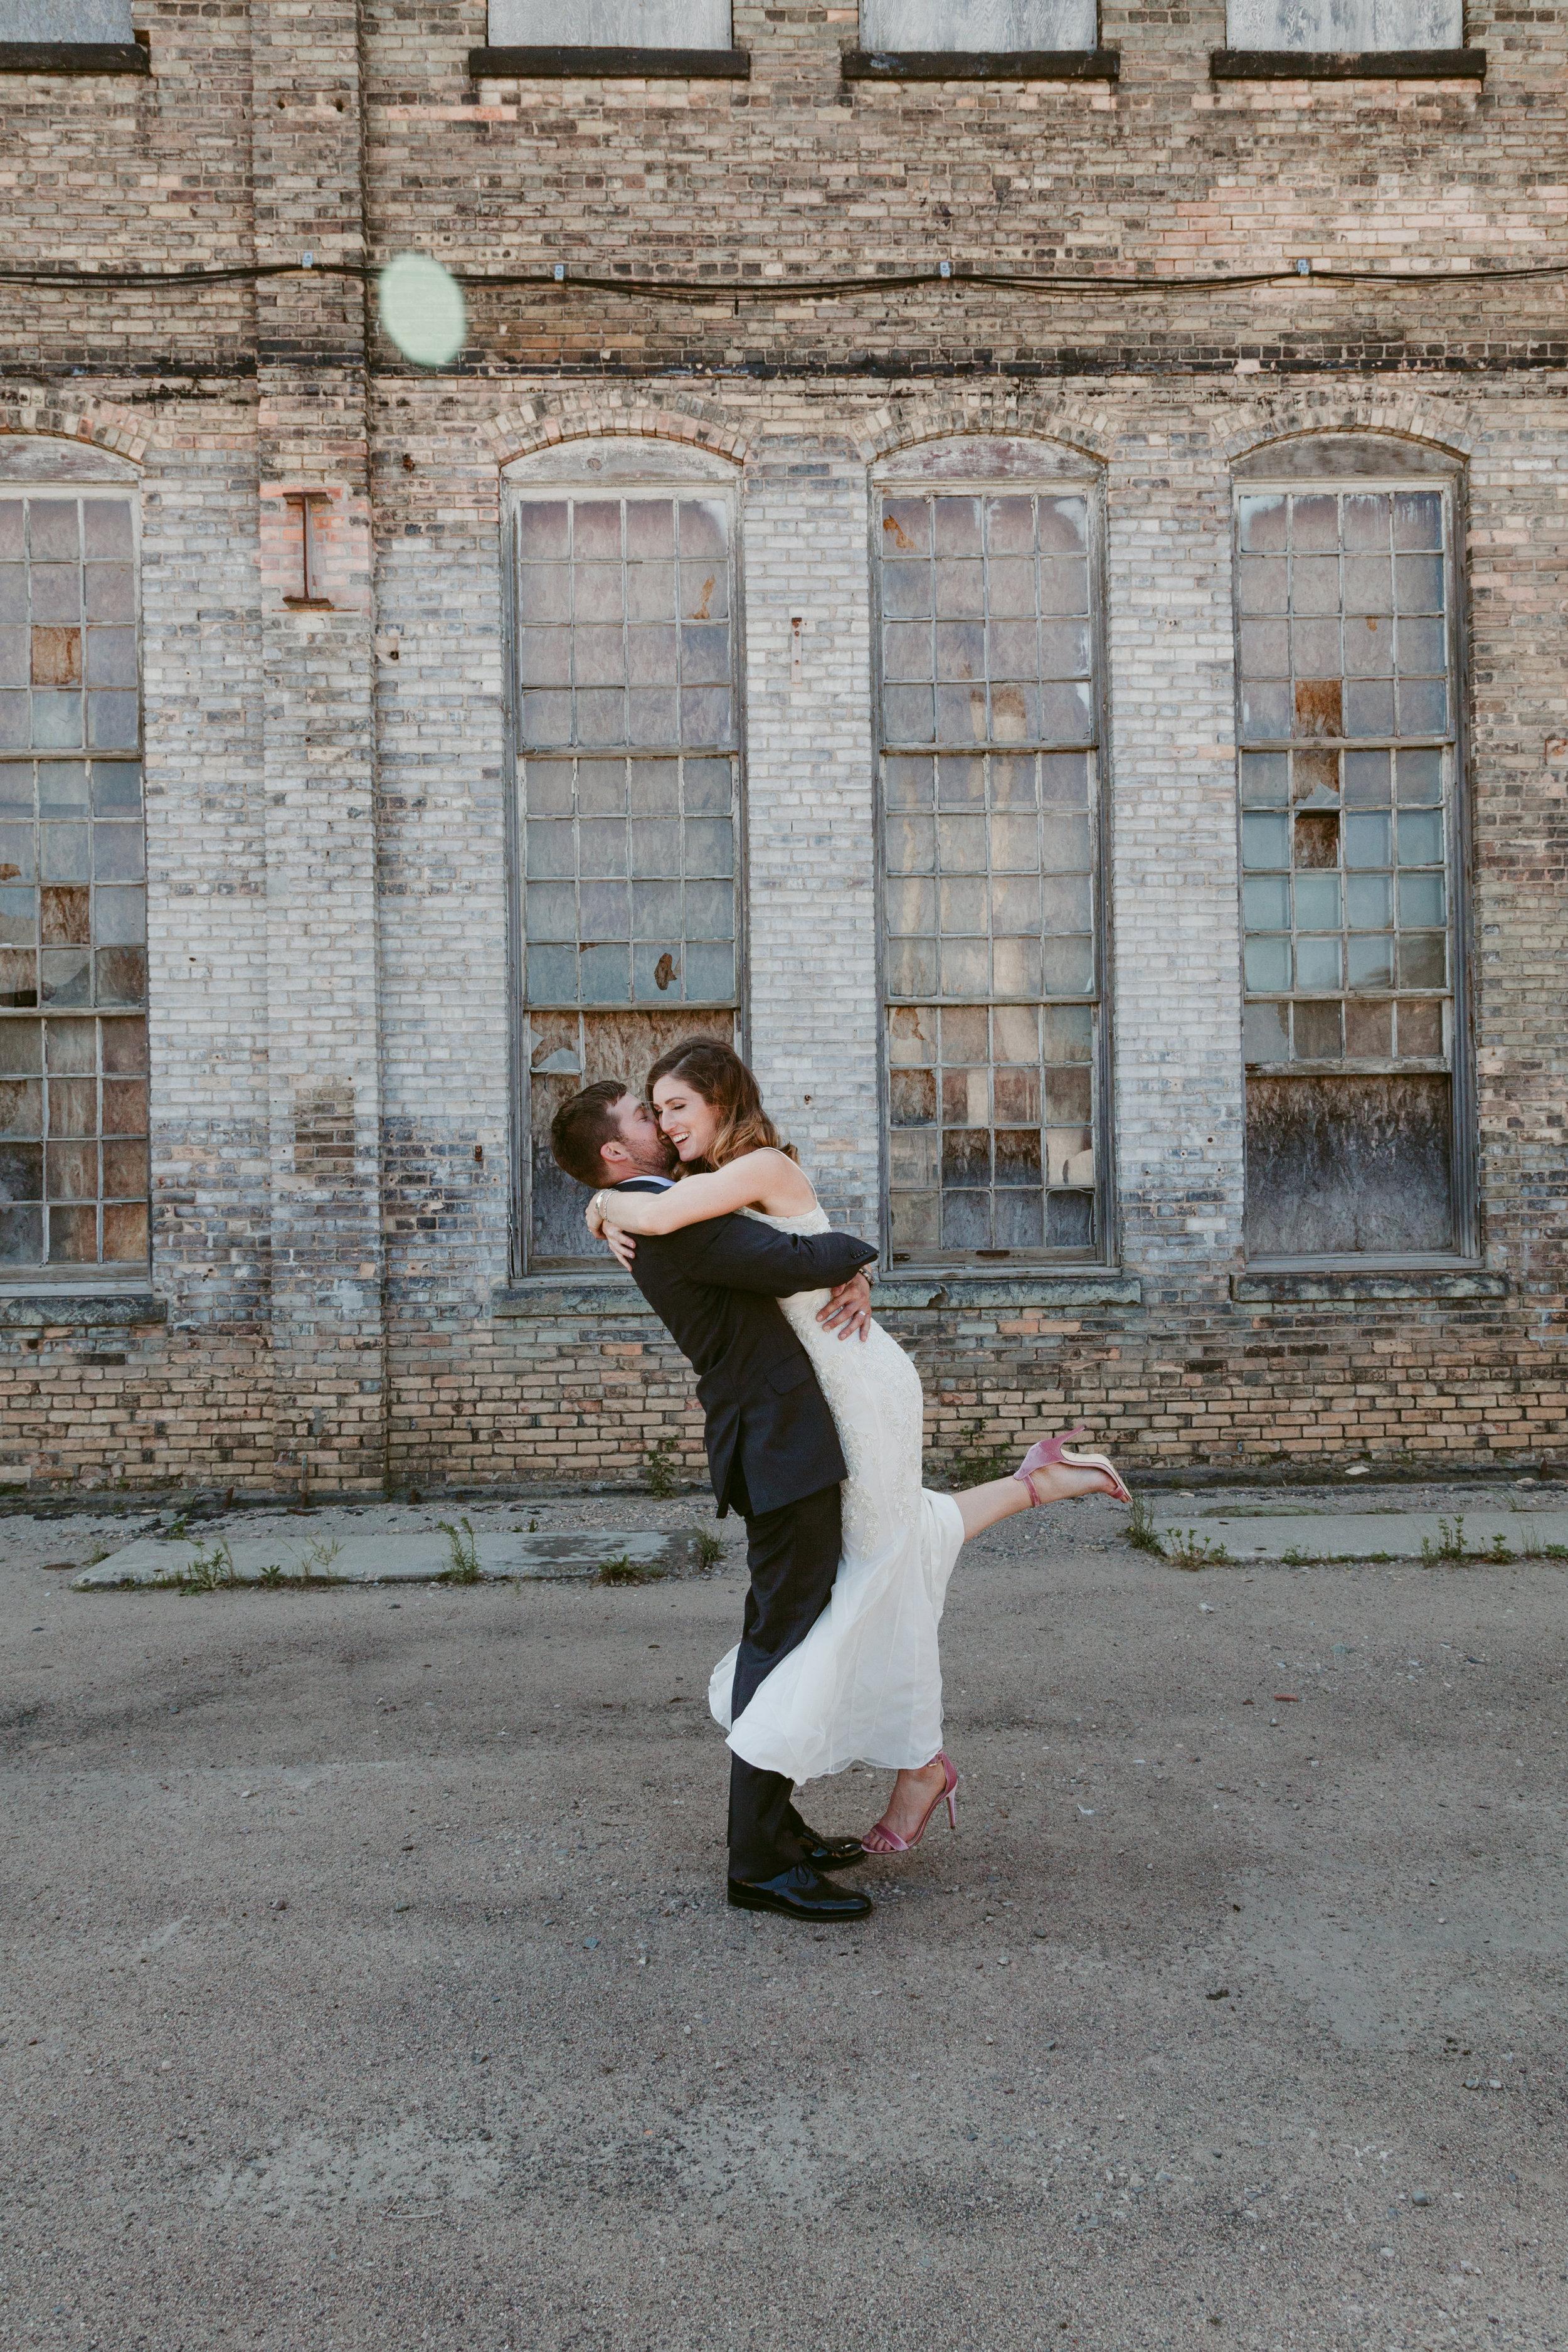 Danielle_Tom_wedding_241.jpg